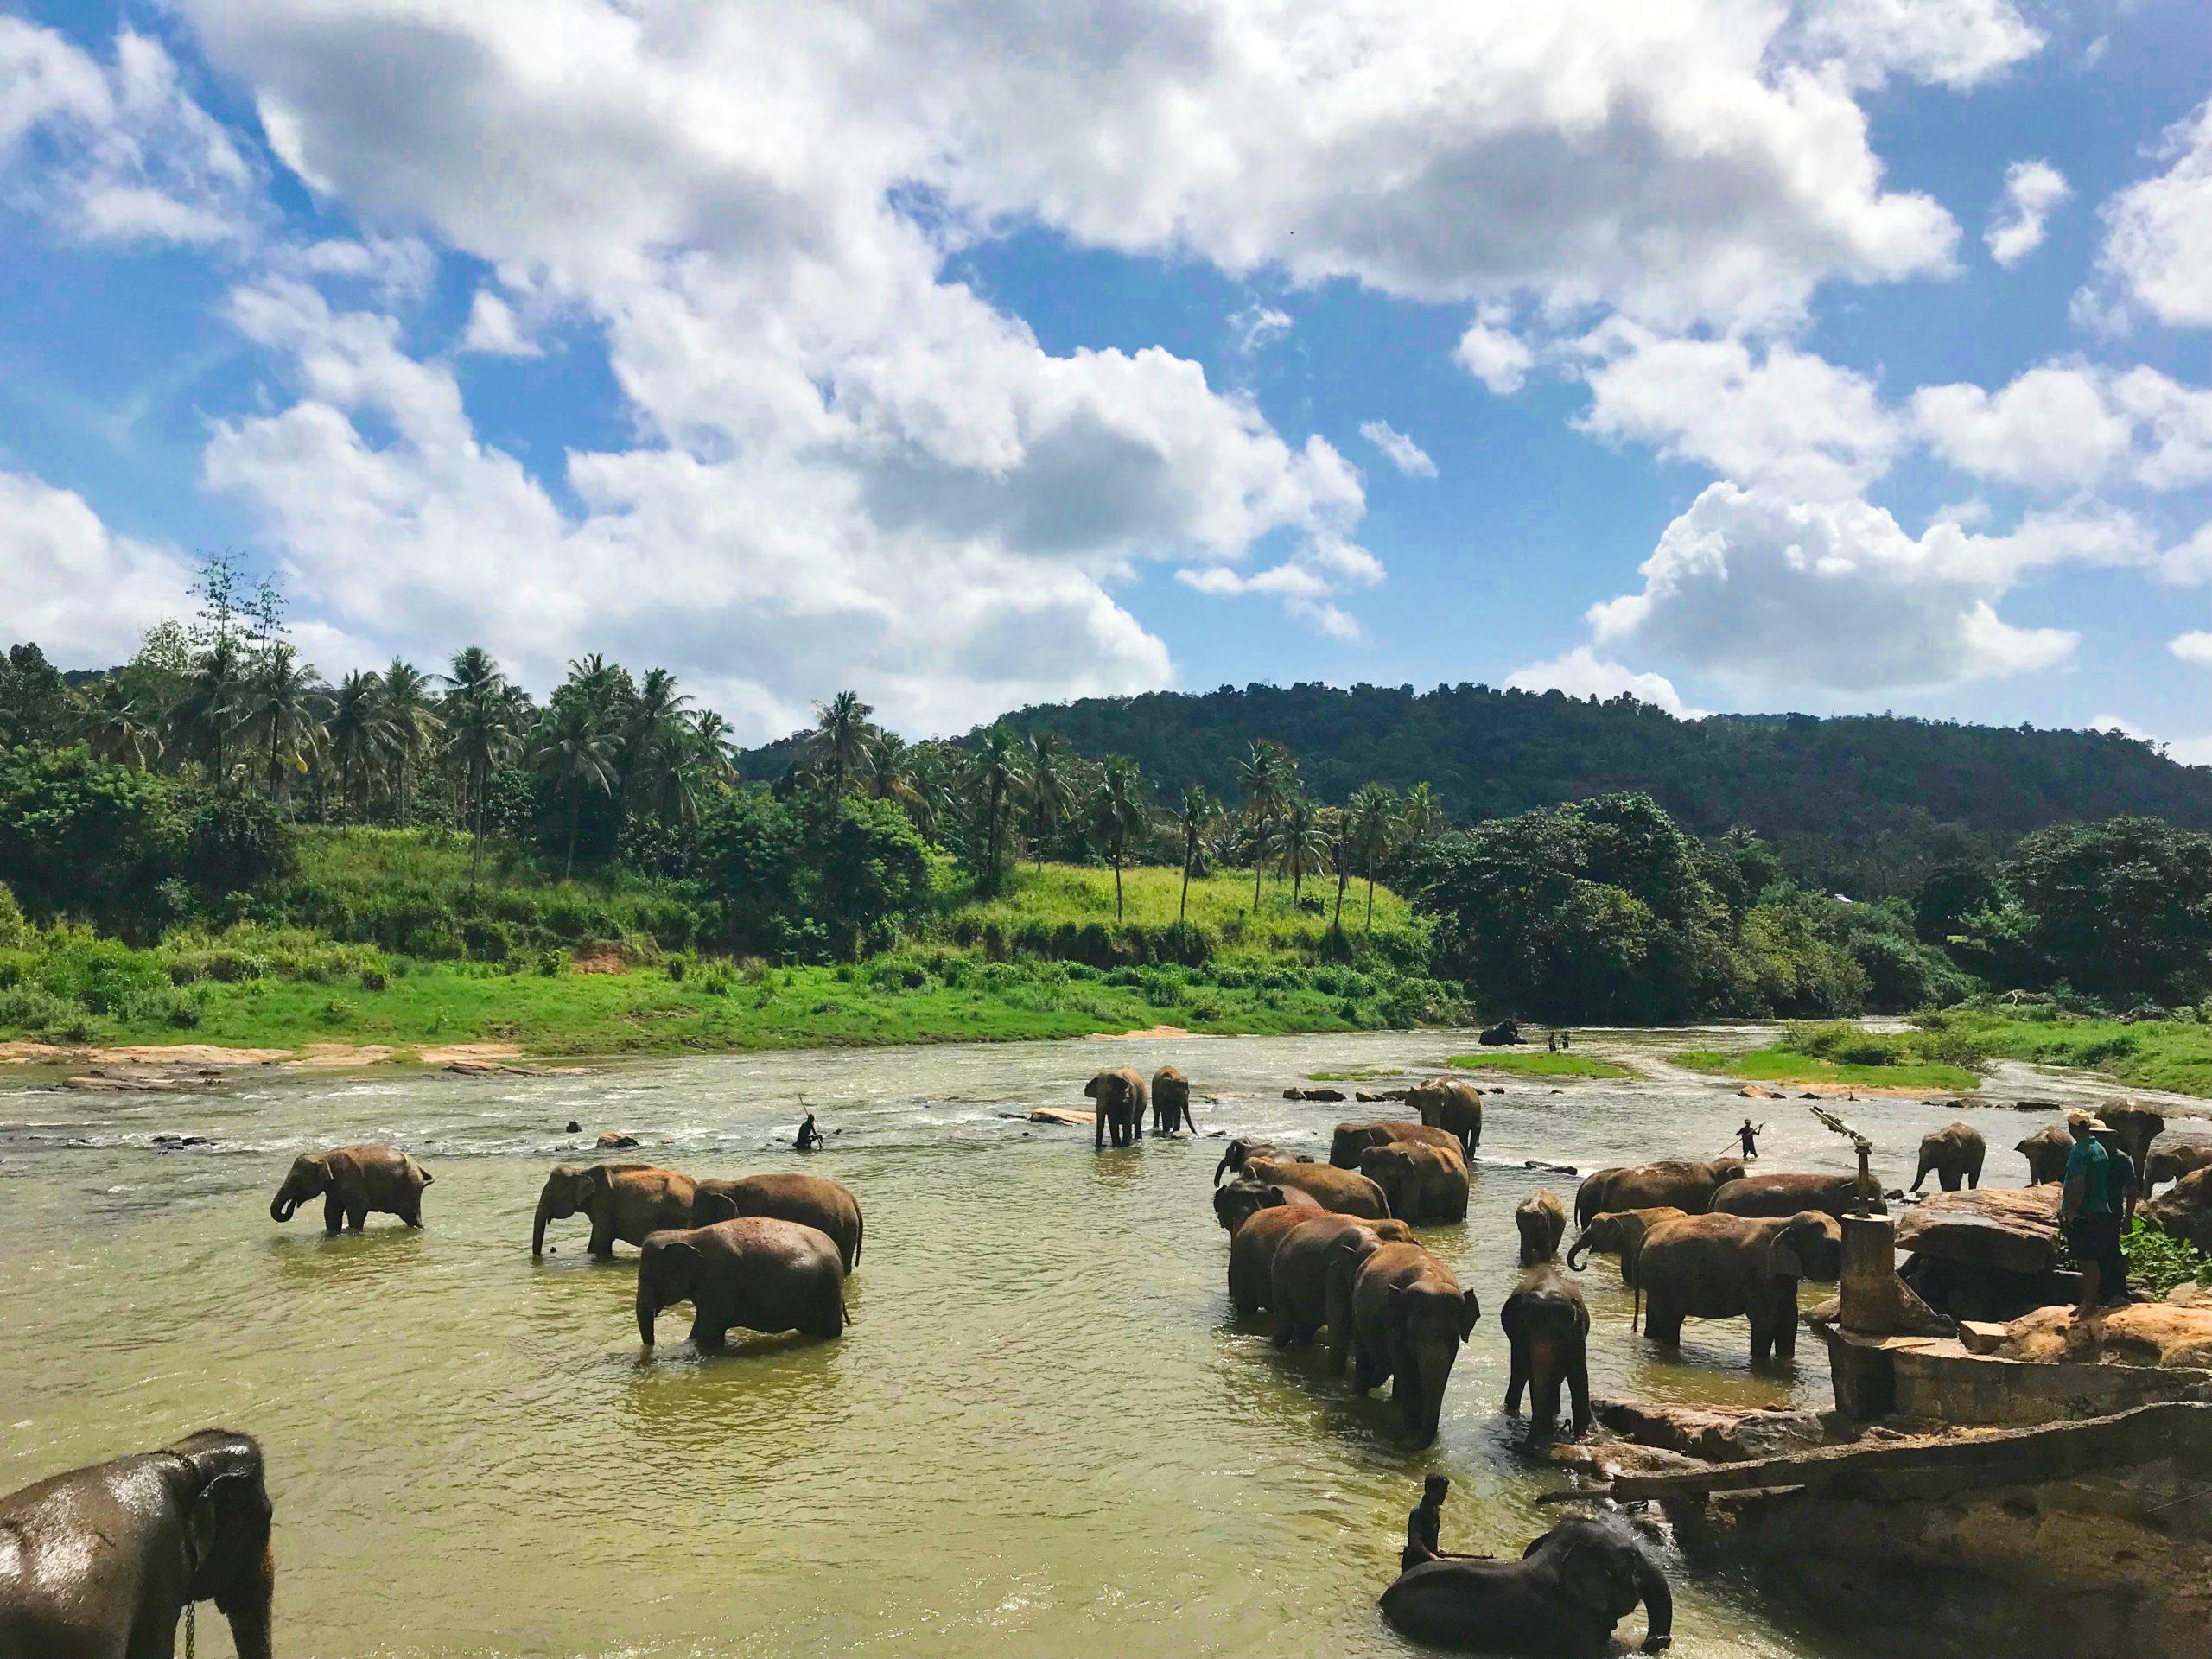 elephants in sri lanka in Minneriya national park - the gathering